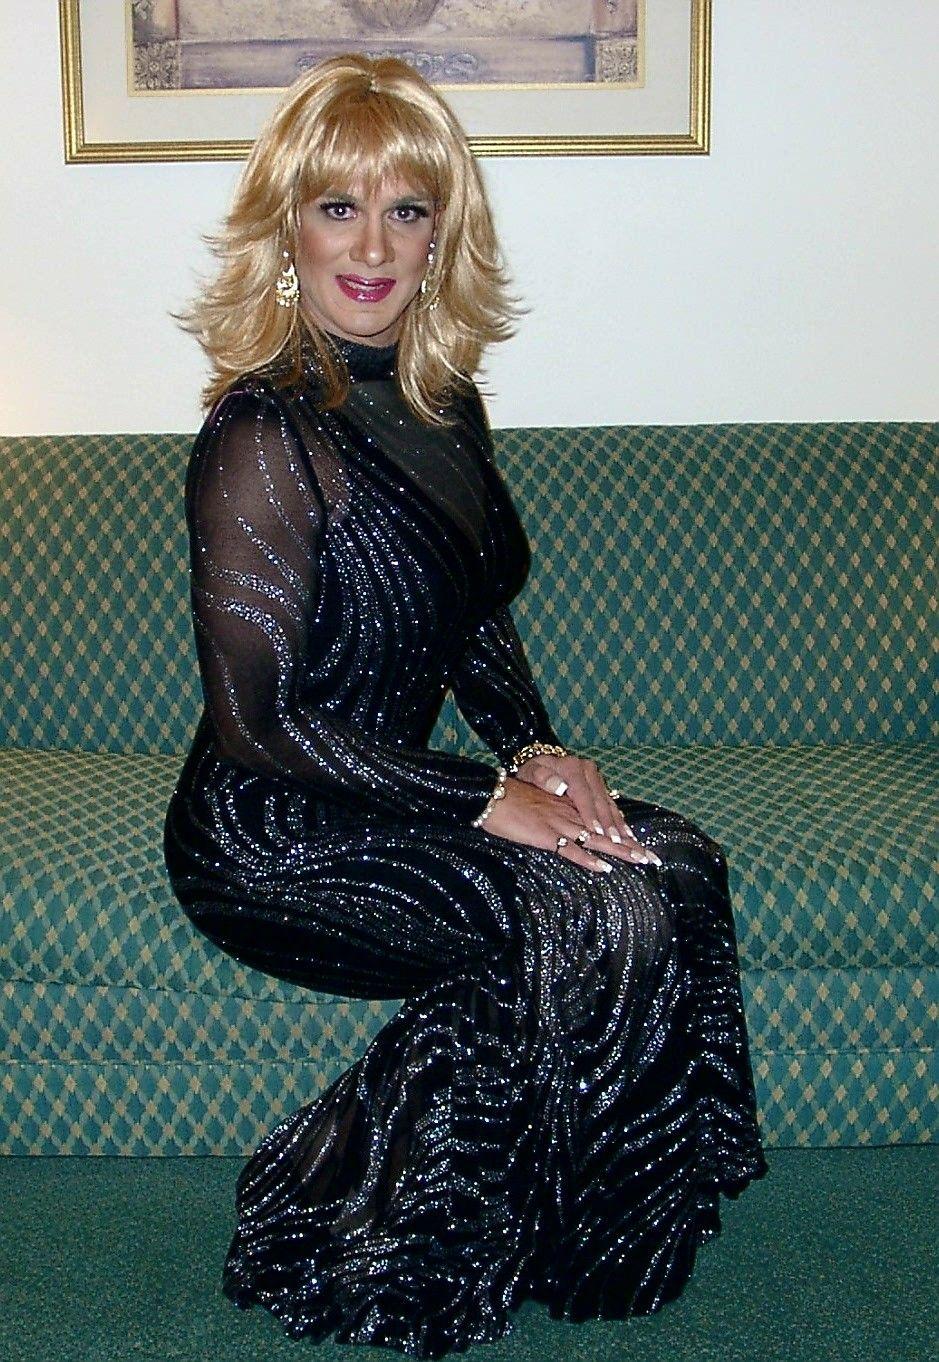 Transvestite formal wear pic